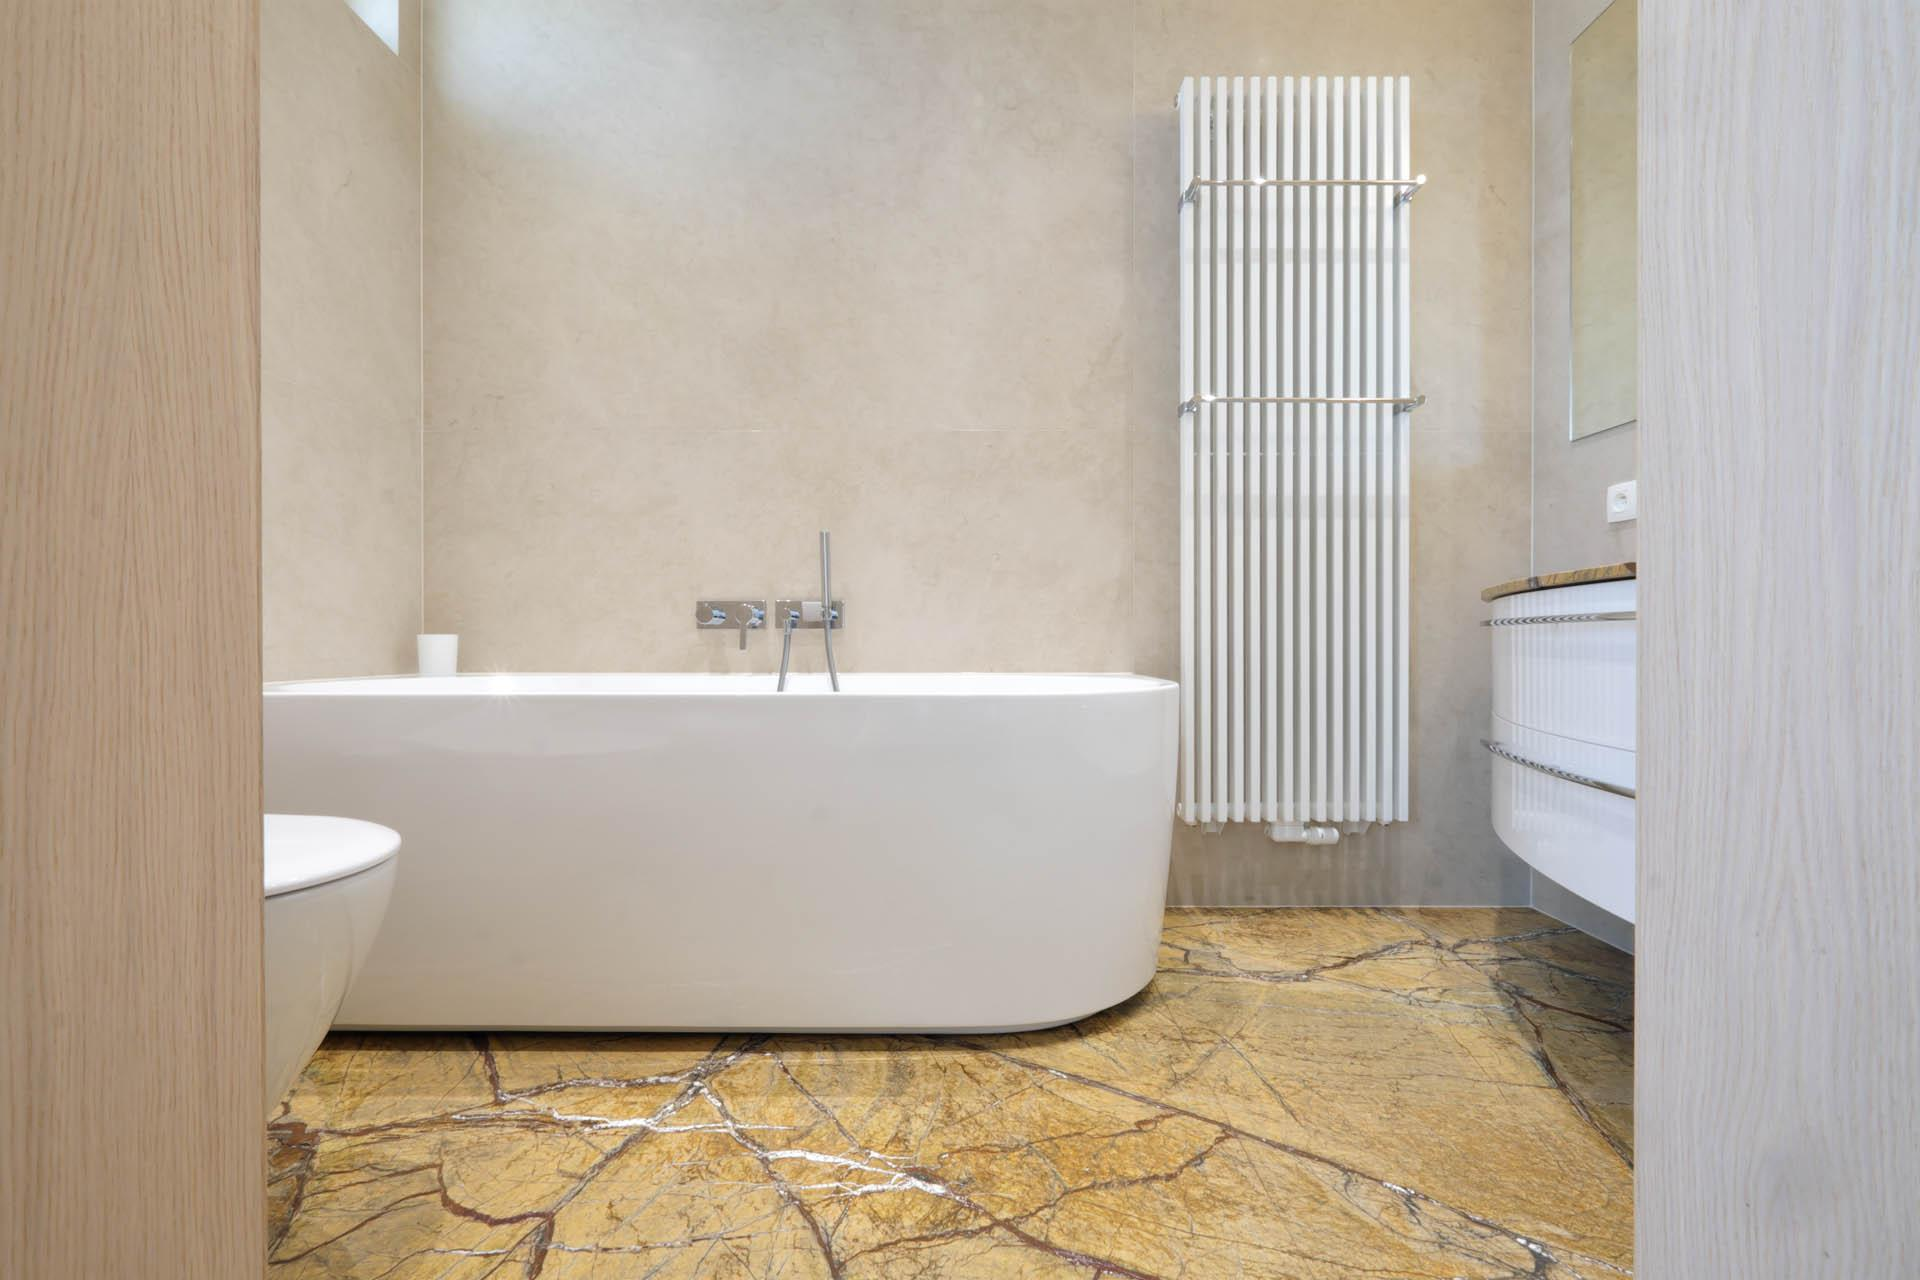 Badezimmer Marmor Beige